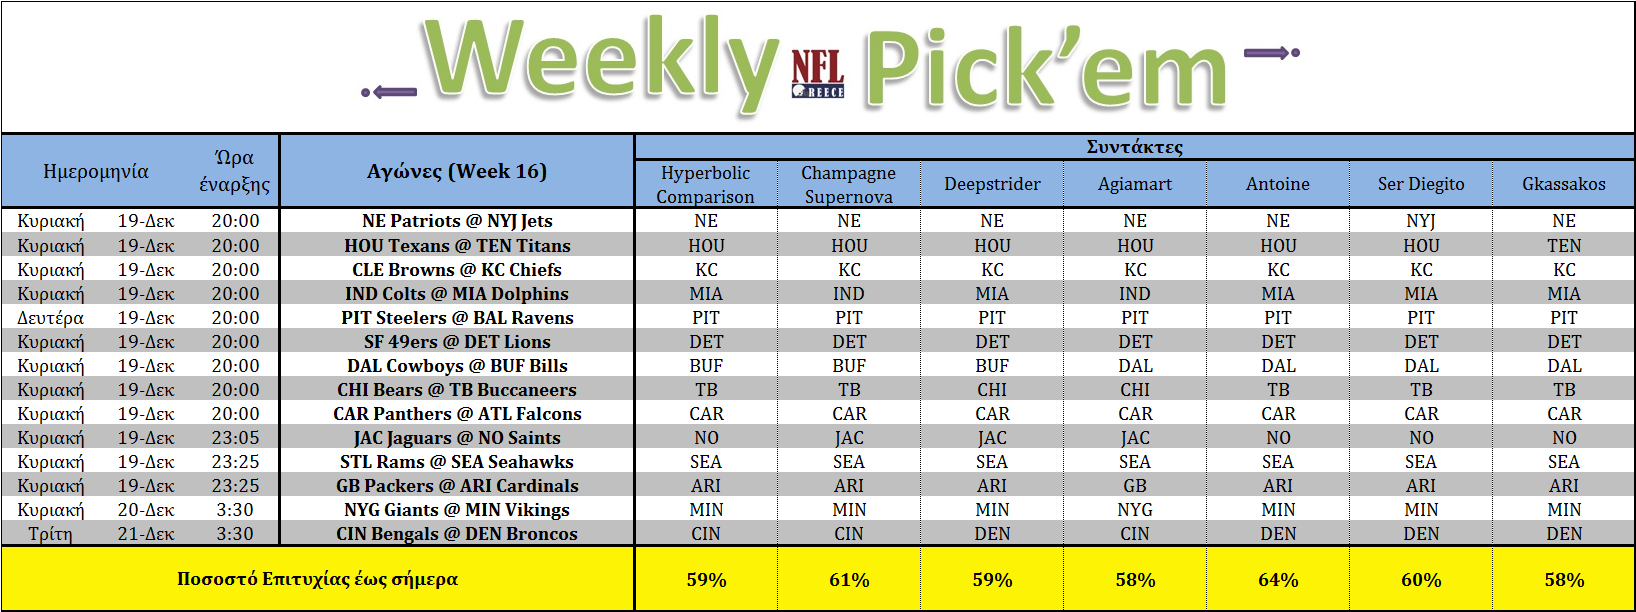 Pickem week 16 2015